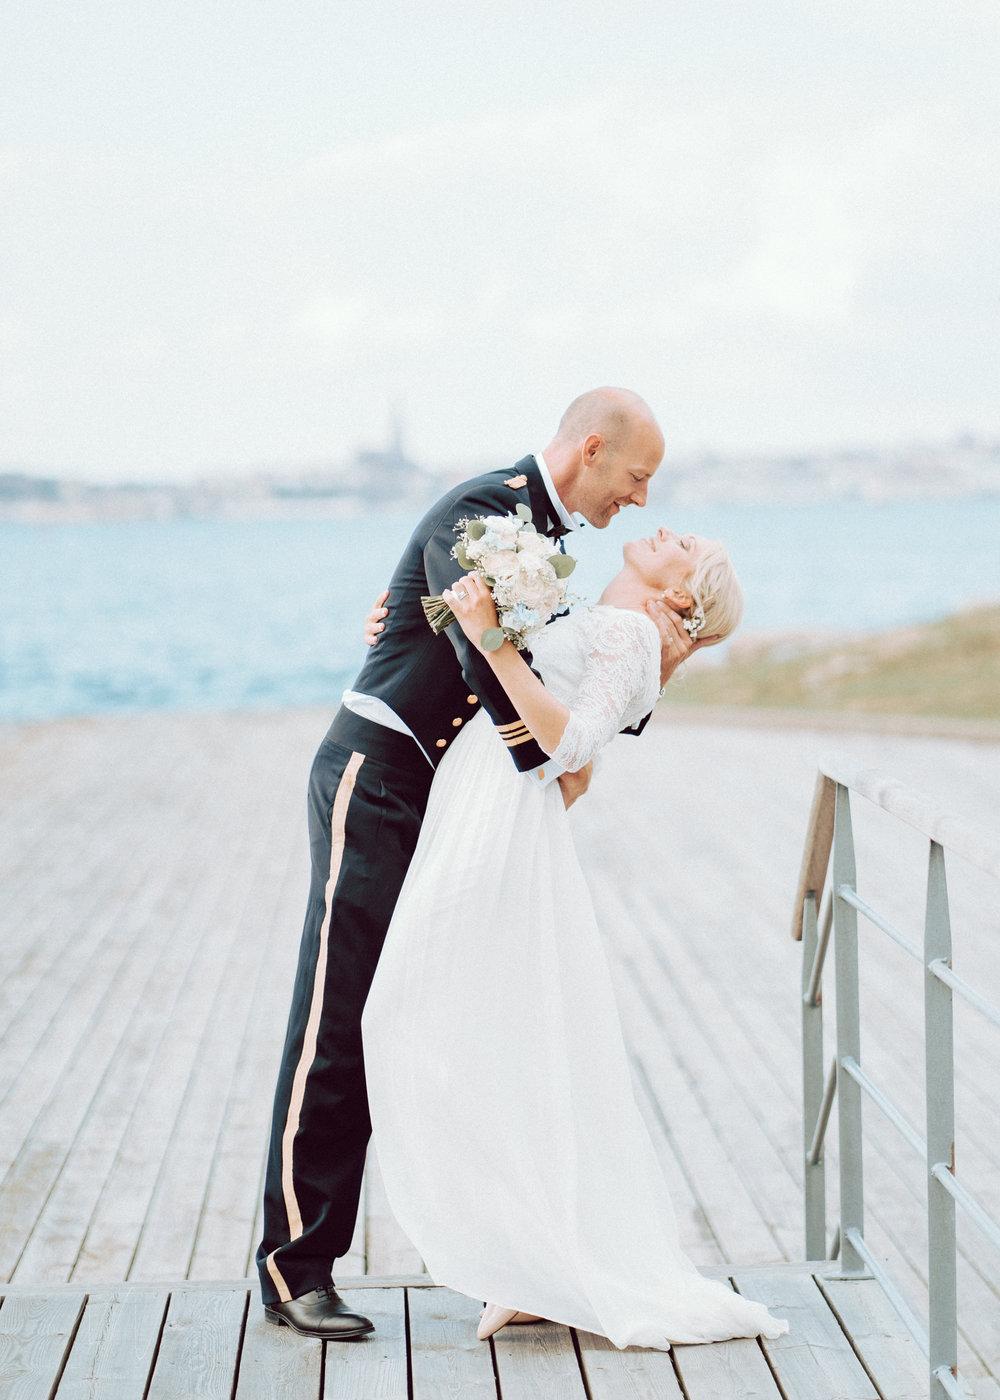 Bröllop-fotografmaxnorin.se-MariaMarcus-358.JPG